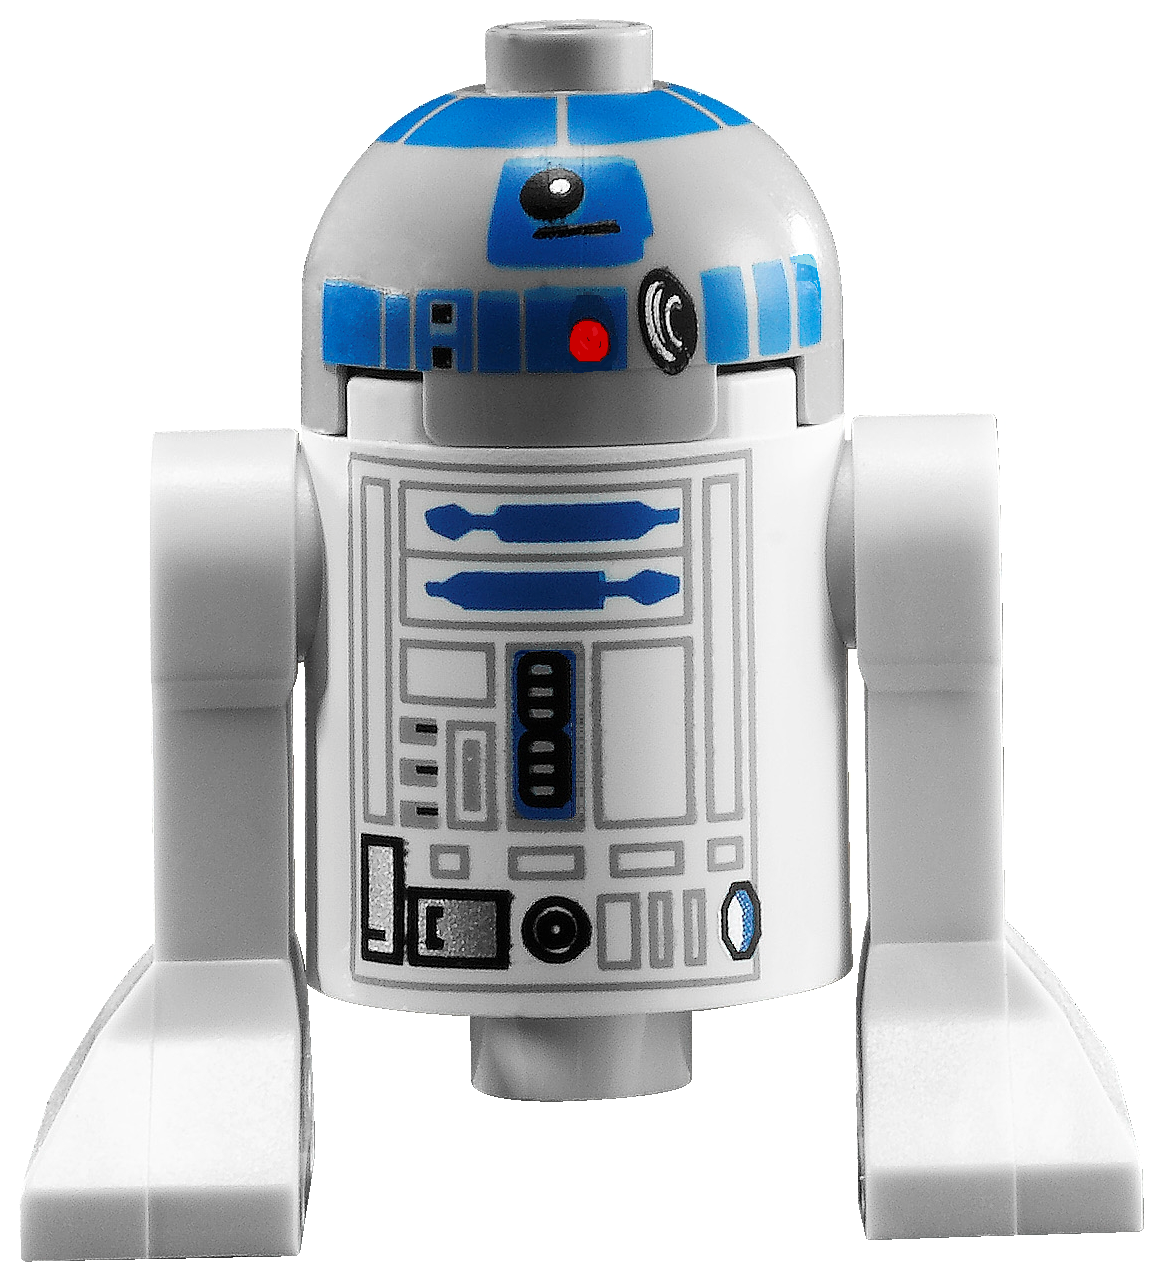 R2 d2 brickipedia fandom powered by wikia - Lego starwars r2d2 ...